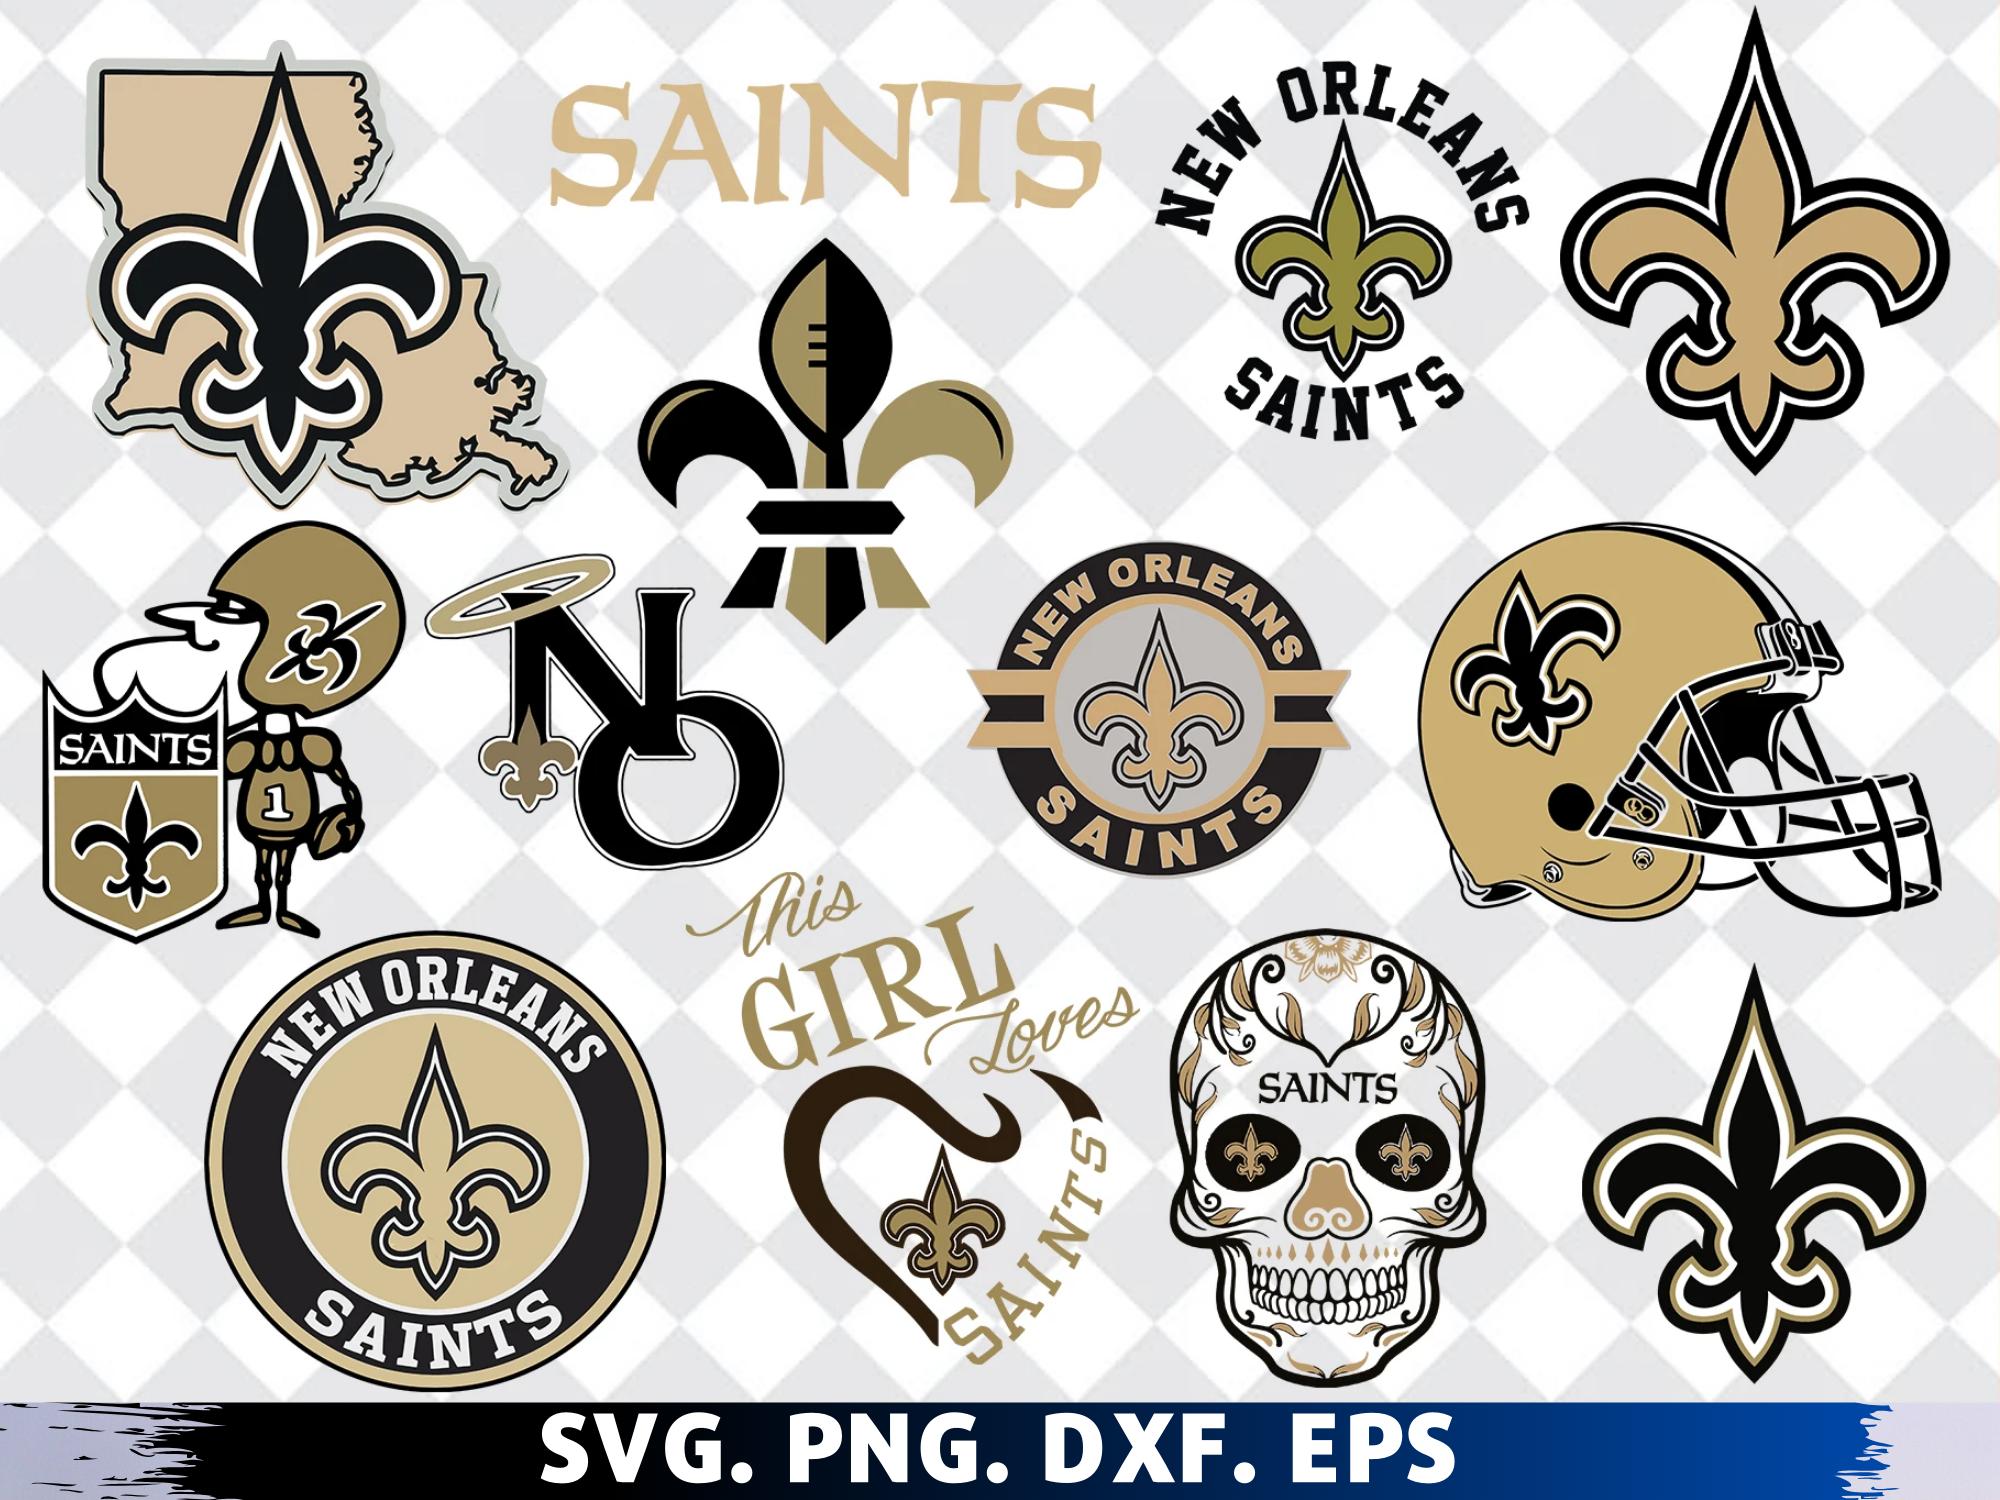 Clipartshop New Orleans Saints New Orleans Saints Svg New Orleans Saints Logo New Orleans Saints Clipart New Orleans Saints Cricut New Orleans Saints New Orleans Saints Shirts New Orleans Saints Football